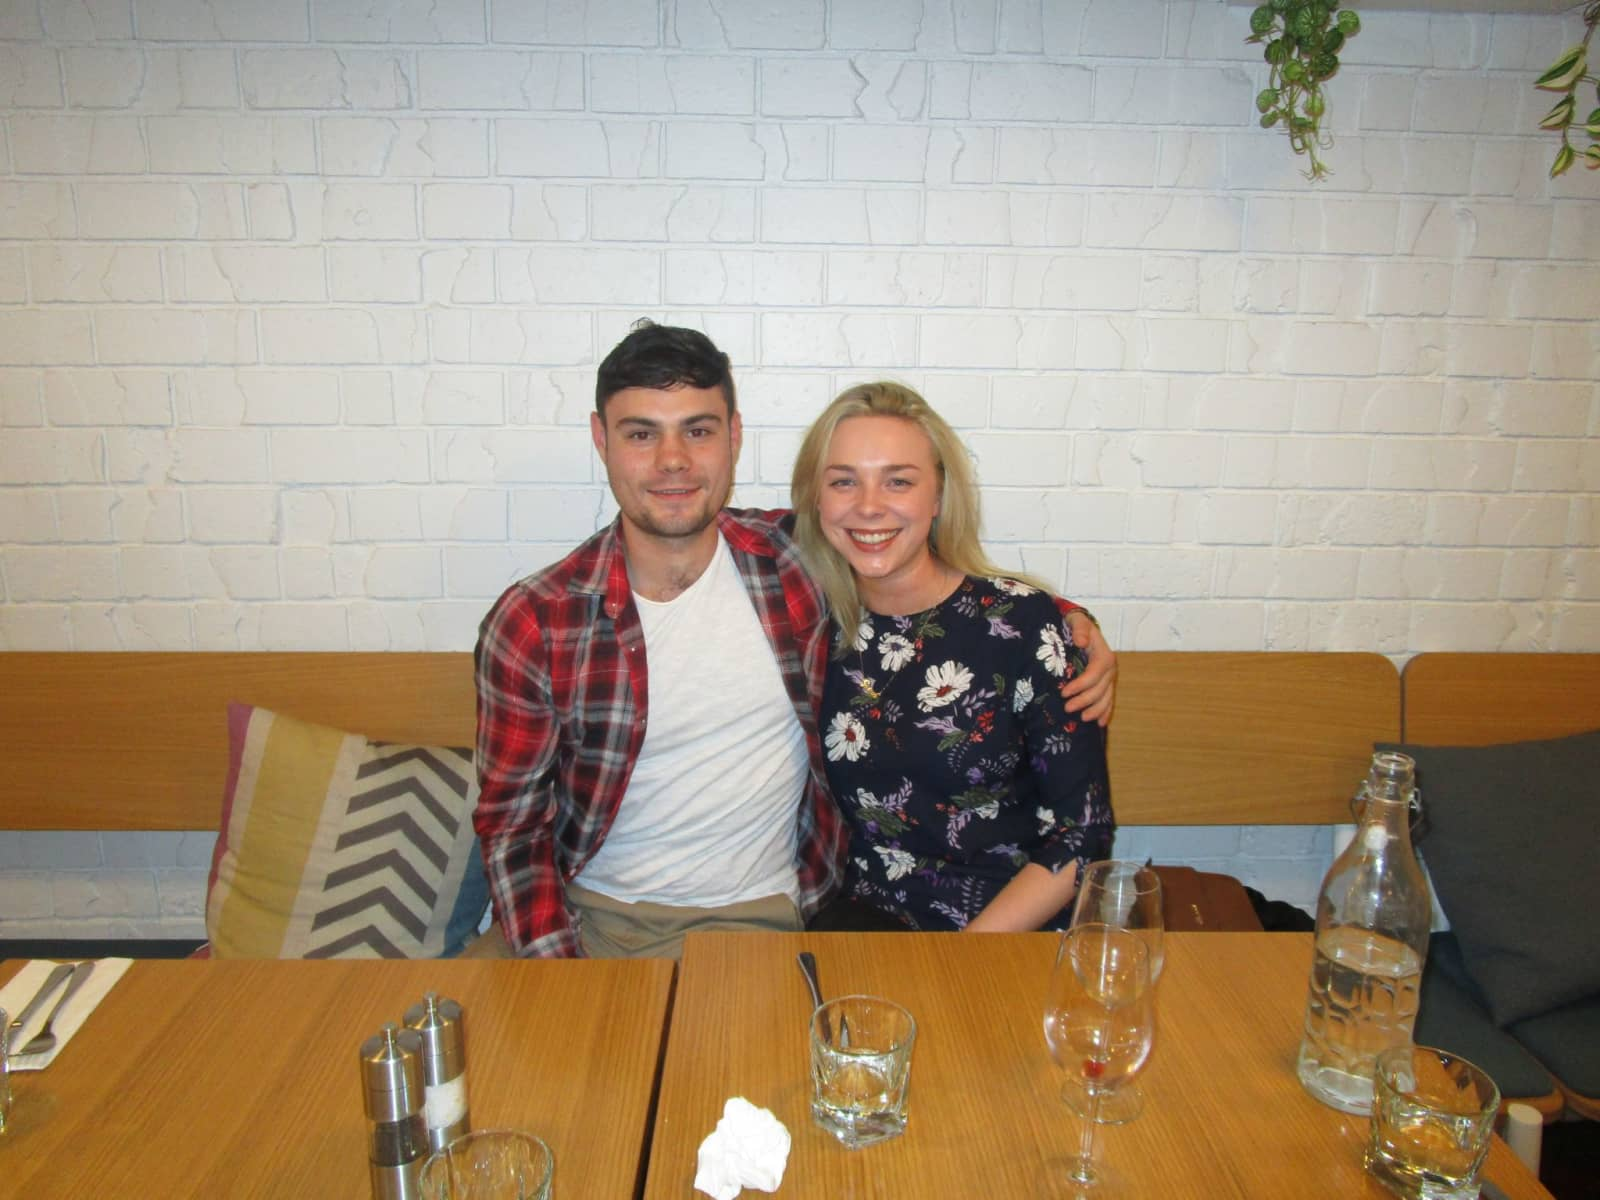 Sarah & Mark from Mangere, New Zealand